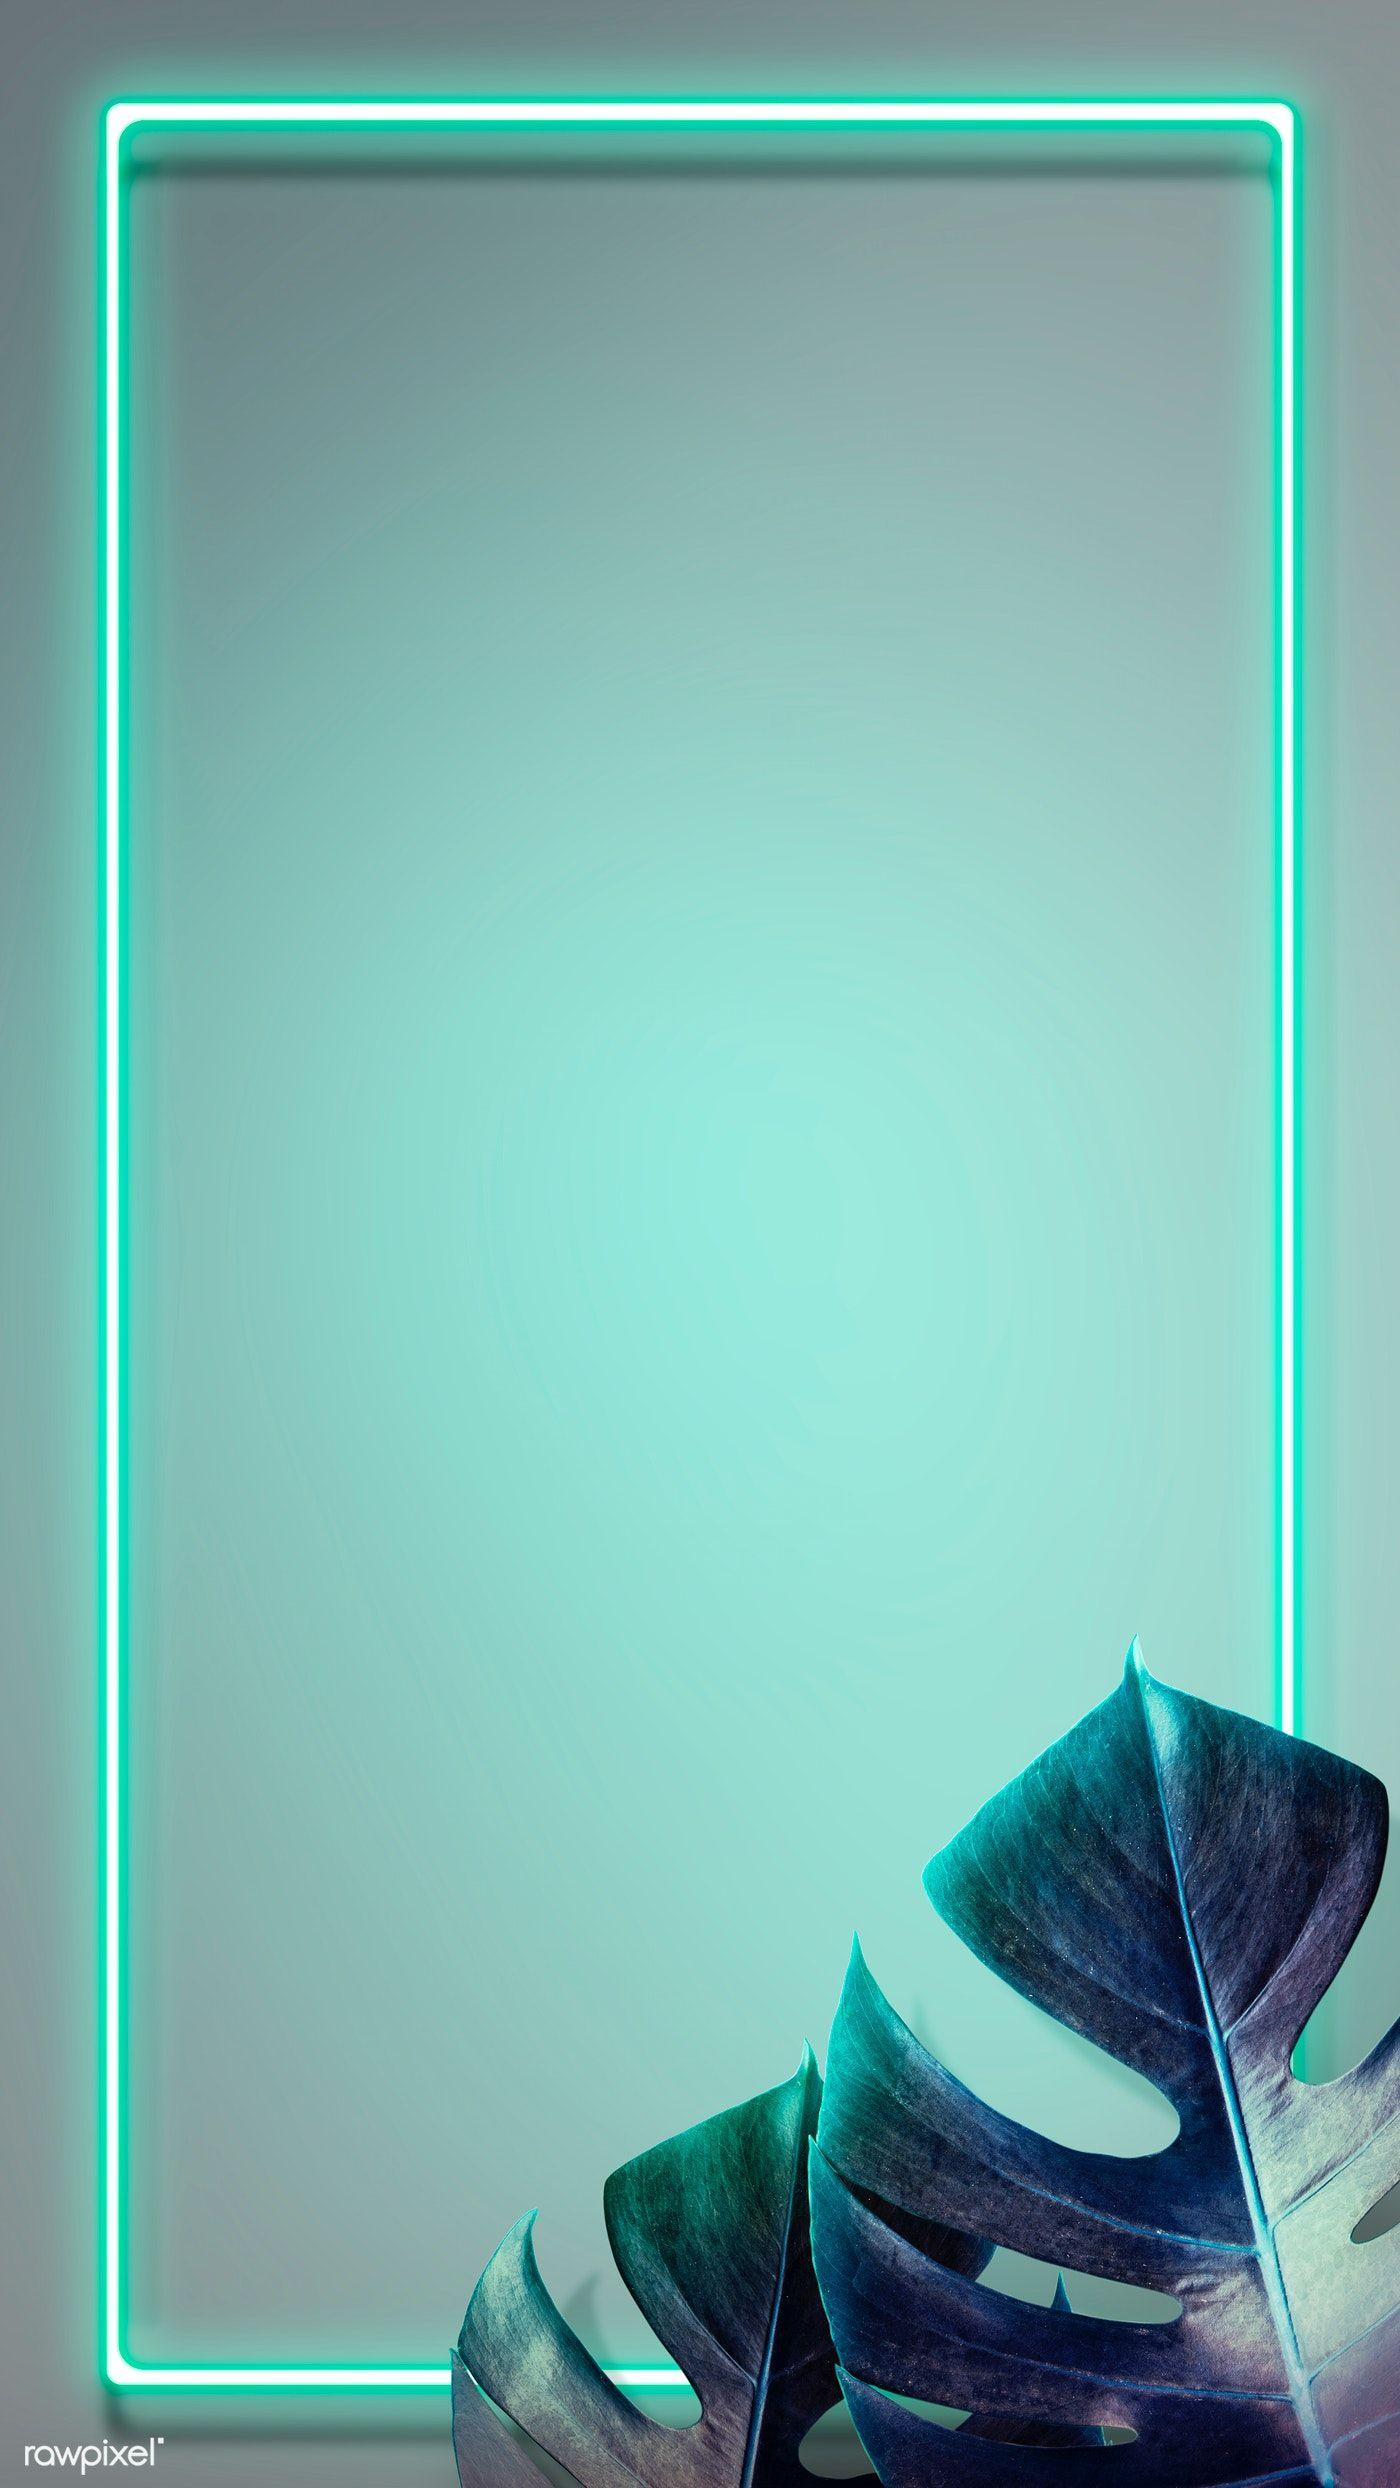 Download Premium Illustration Of Tropical Green Neon Lights Phone Screen Neon Wallpaper Neon Light Wallpaper Phone Wallpaper Images